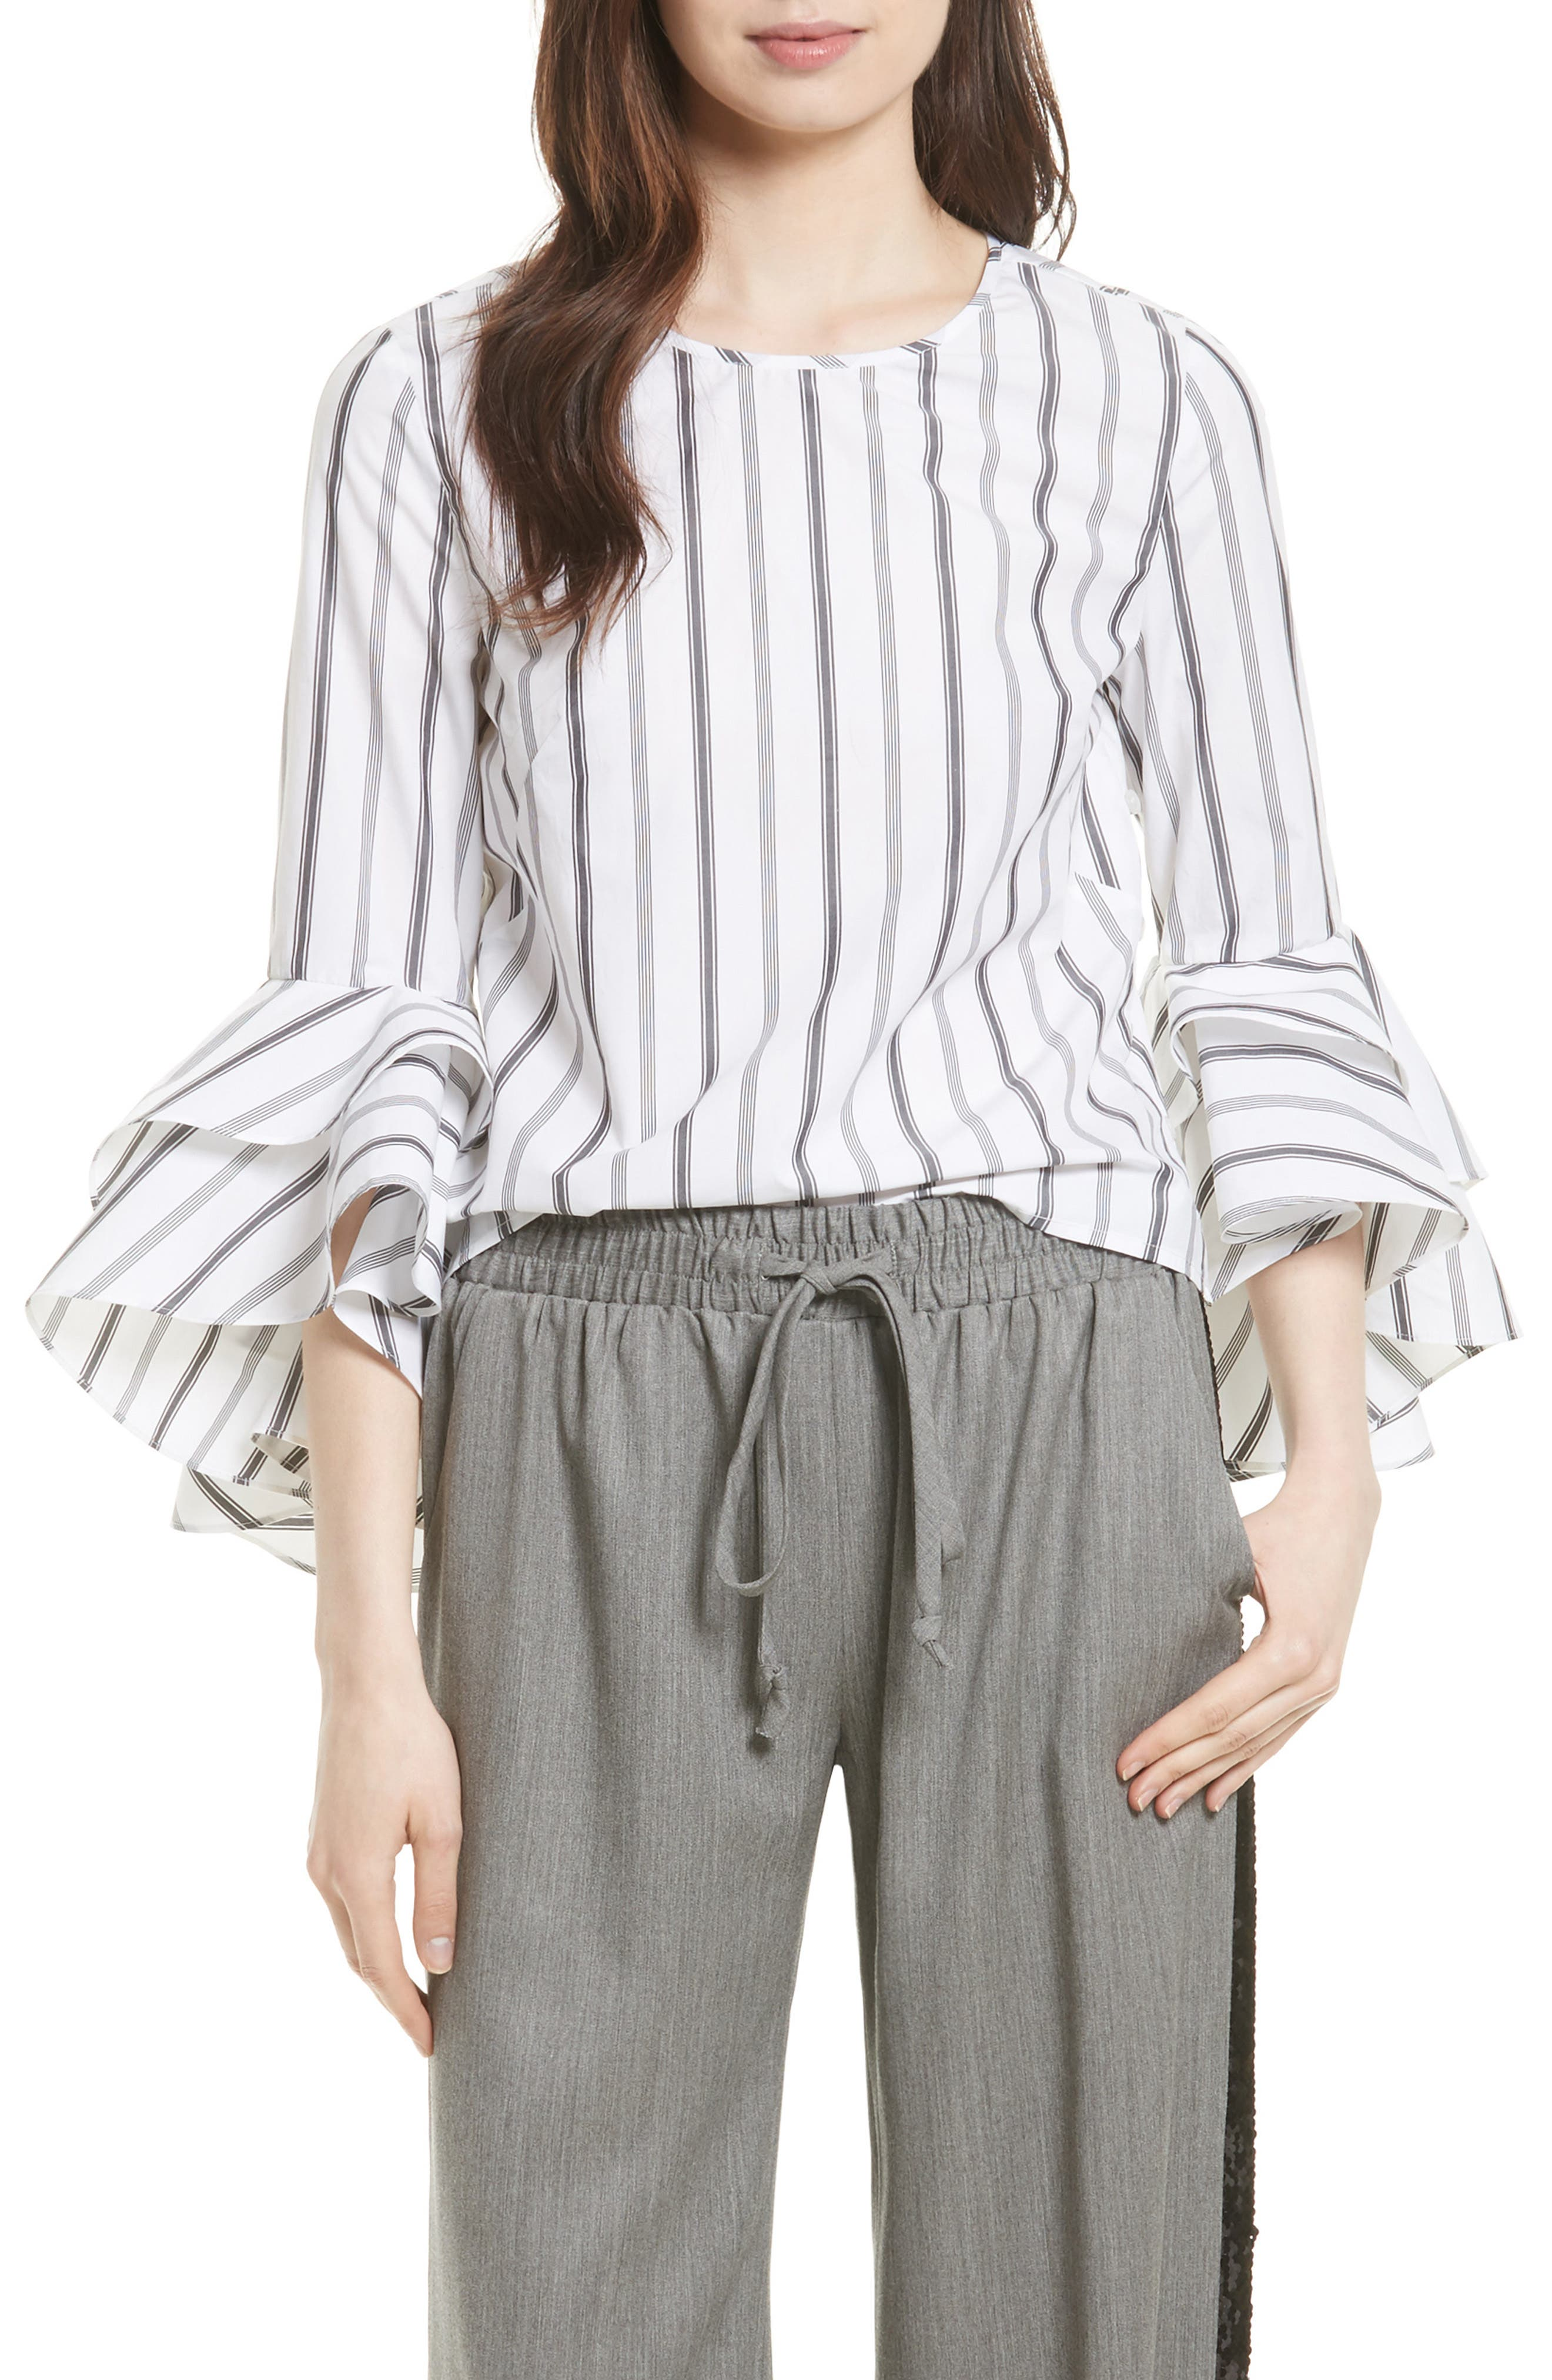 Milly Gabby Stripe Bell Sleeve Top